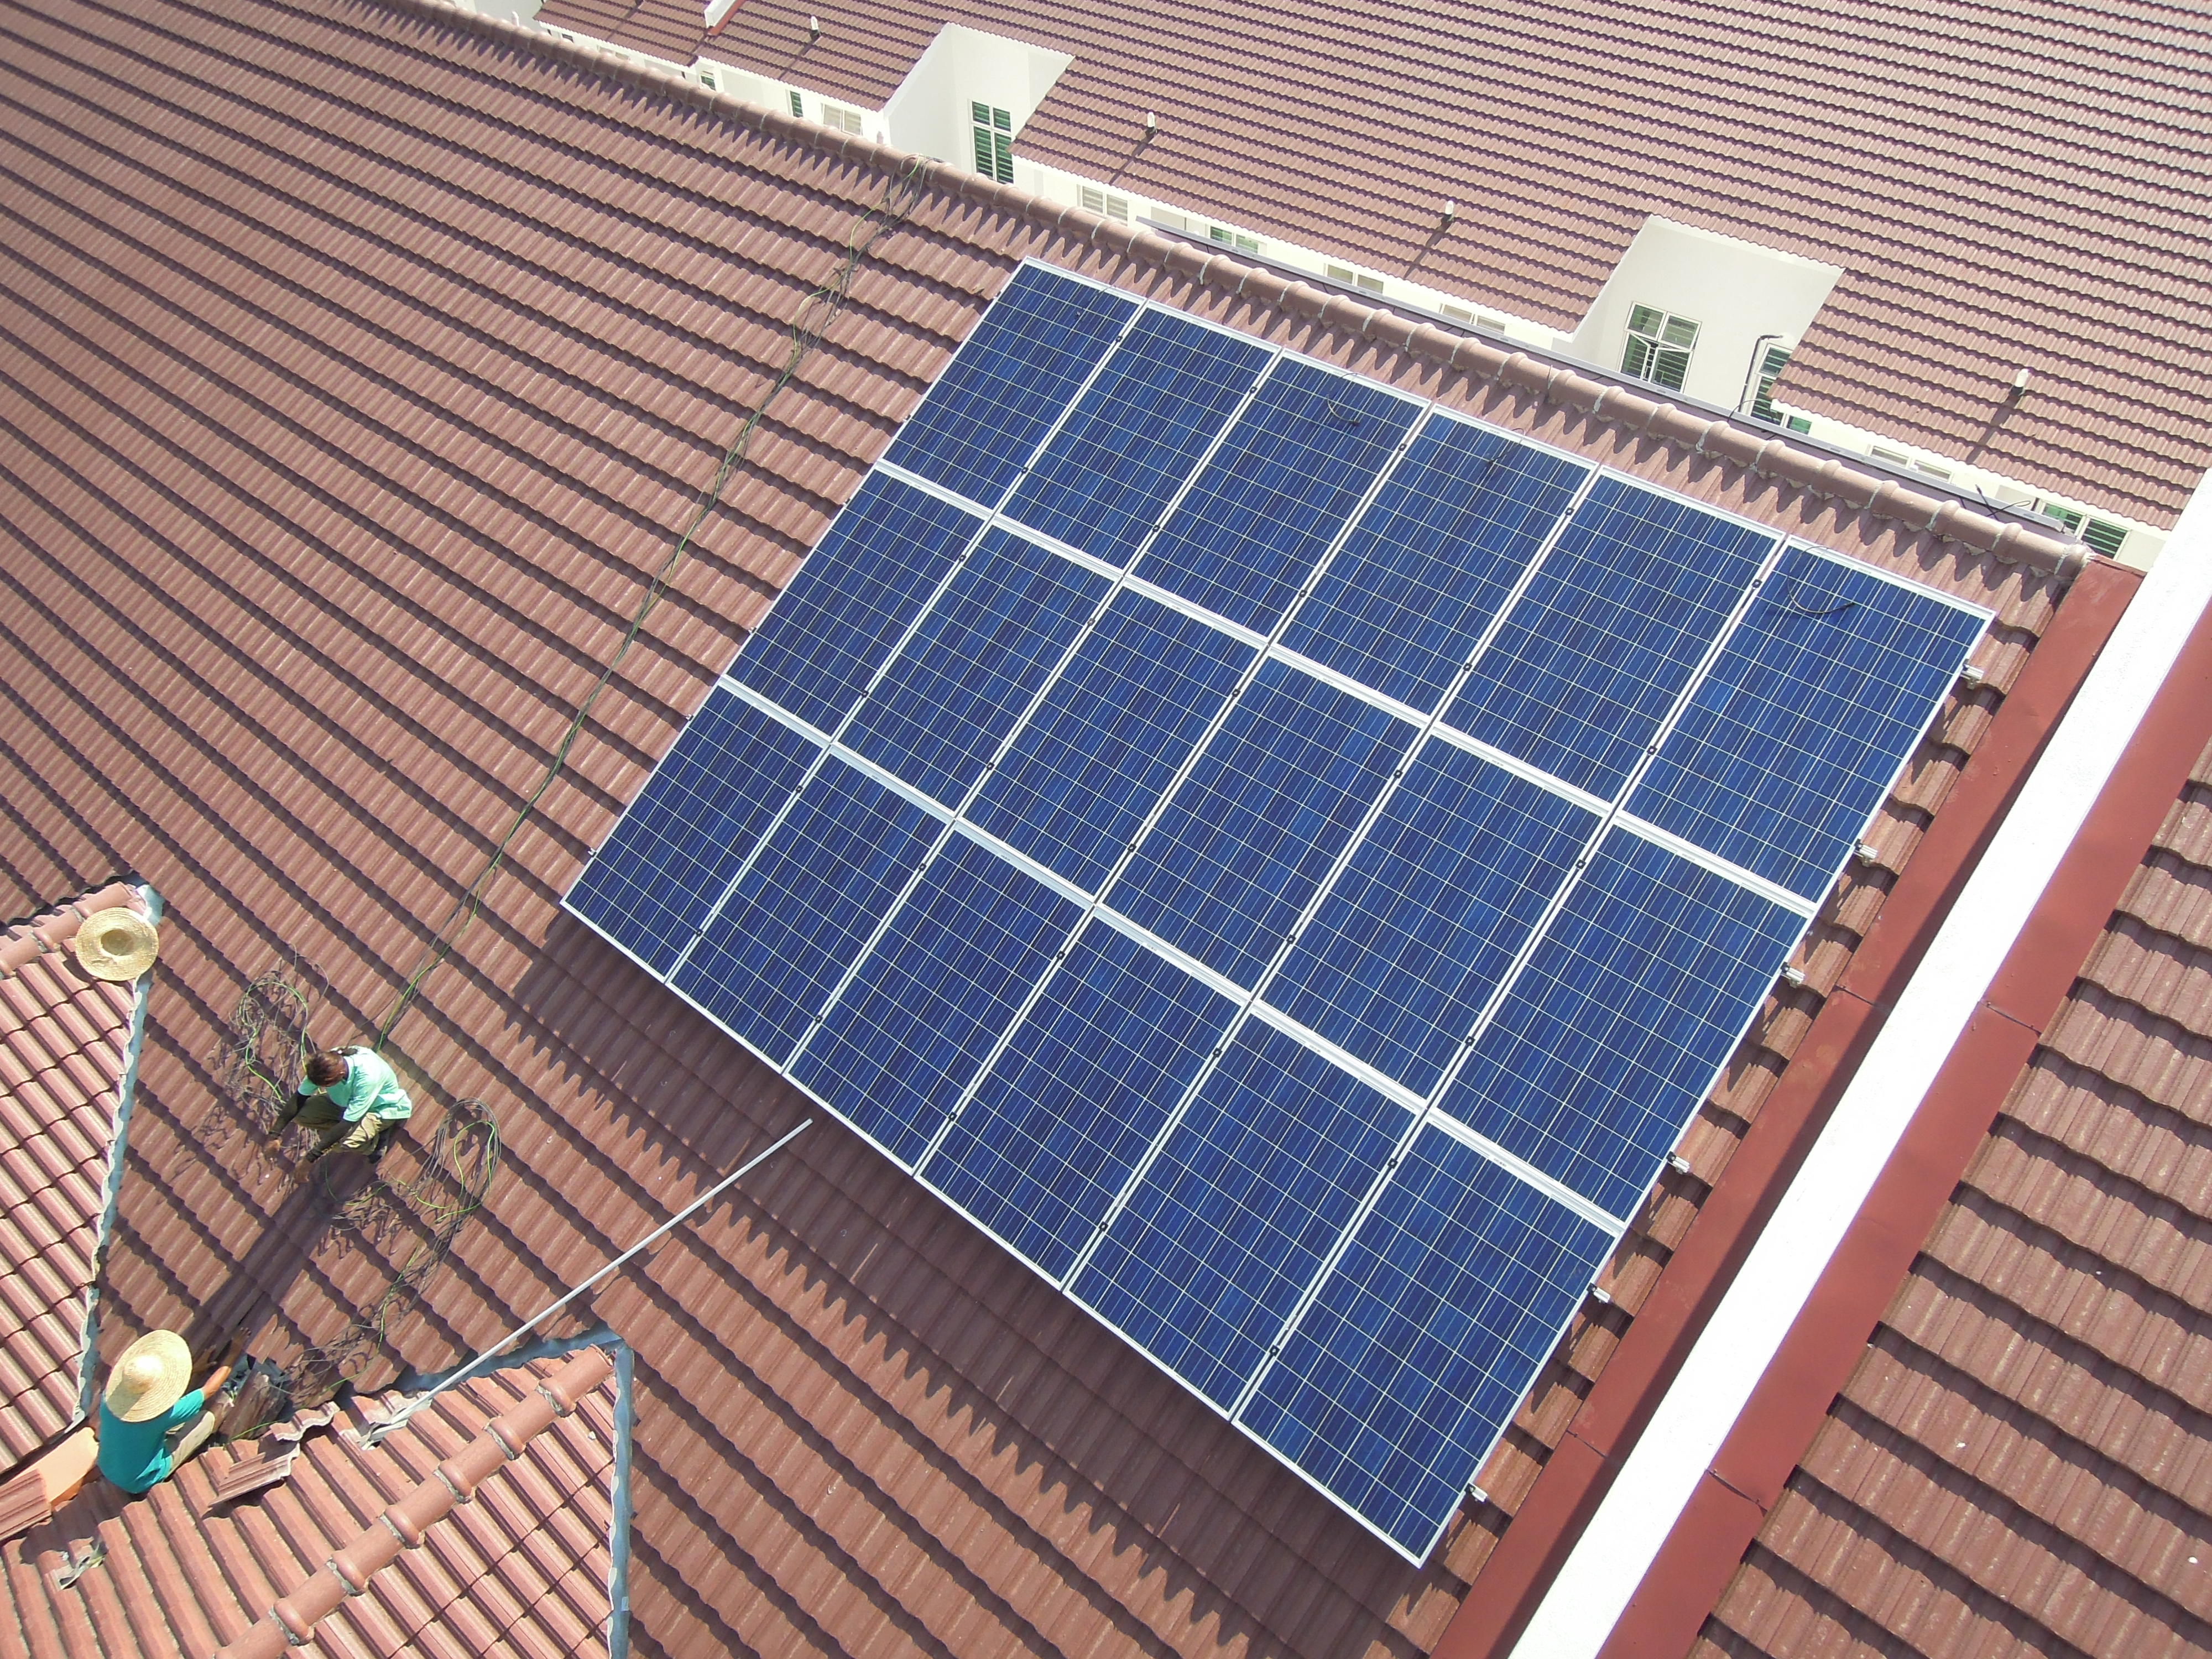 Solar Roof Residential Balik Pulau Penang 10kW